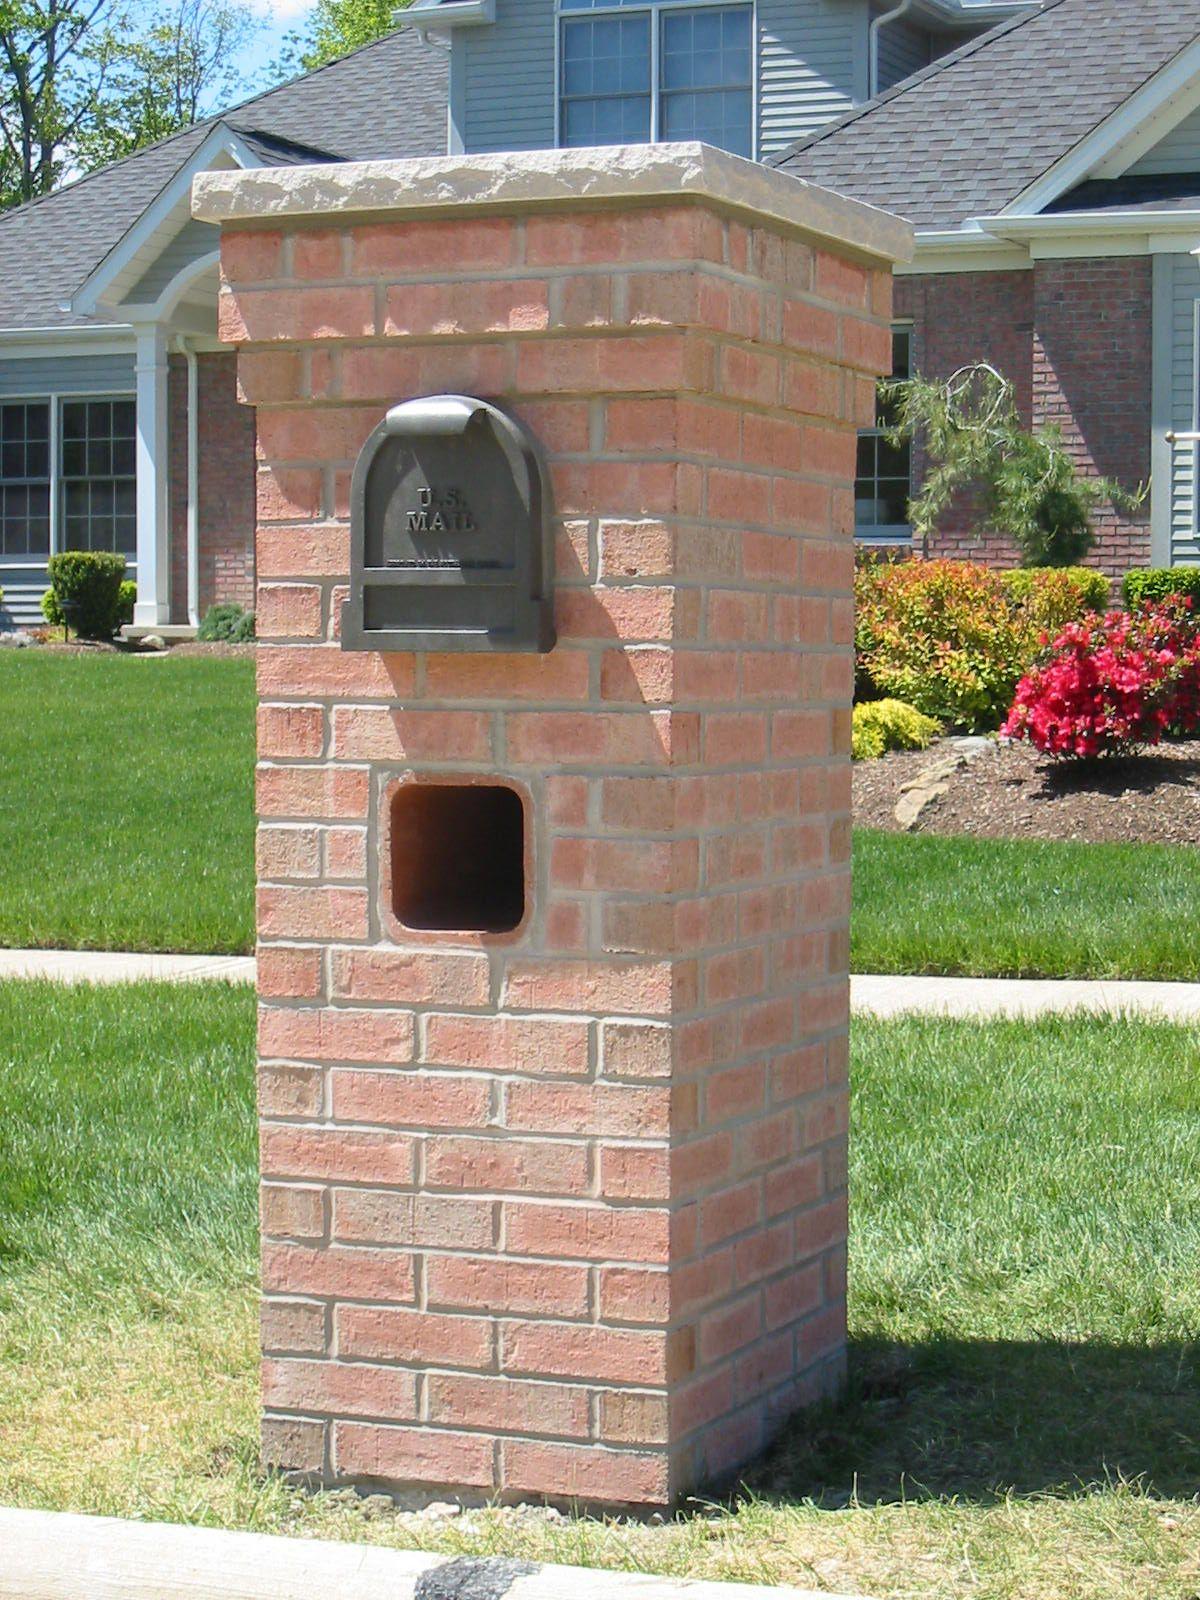 Brick Mailbox Design Pictures Brick Mailbox Mailbox Design